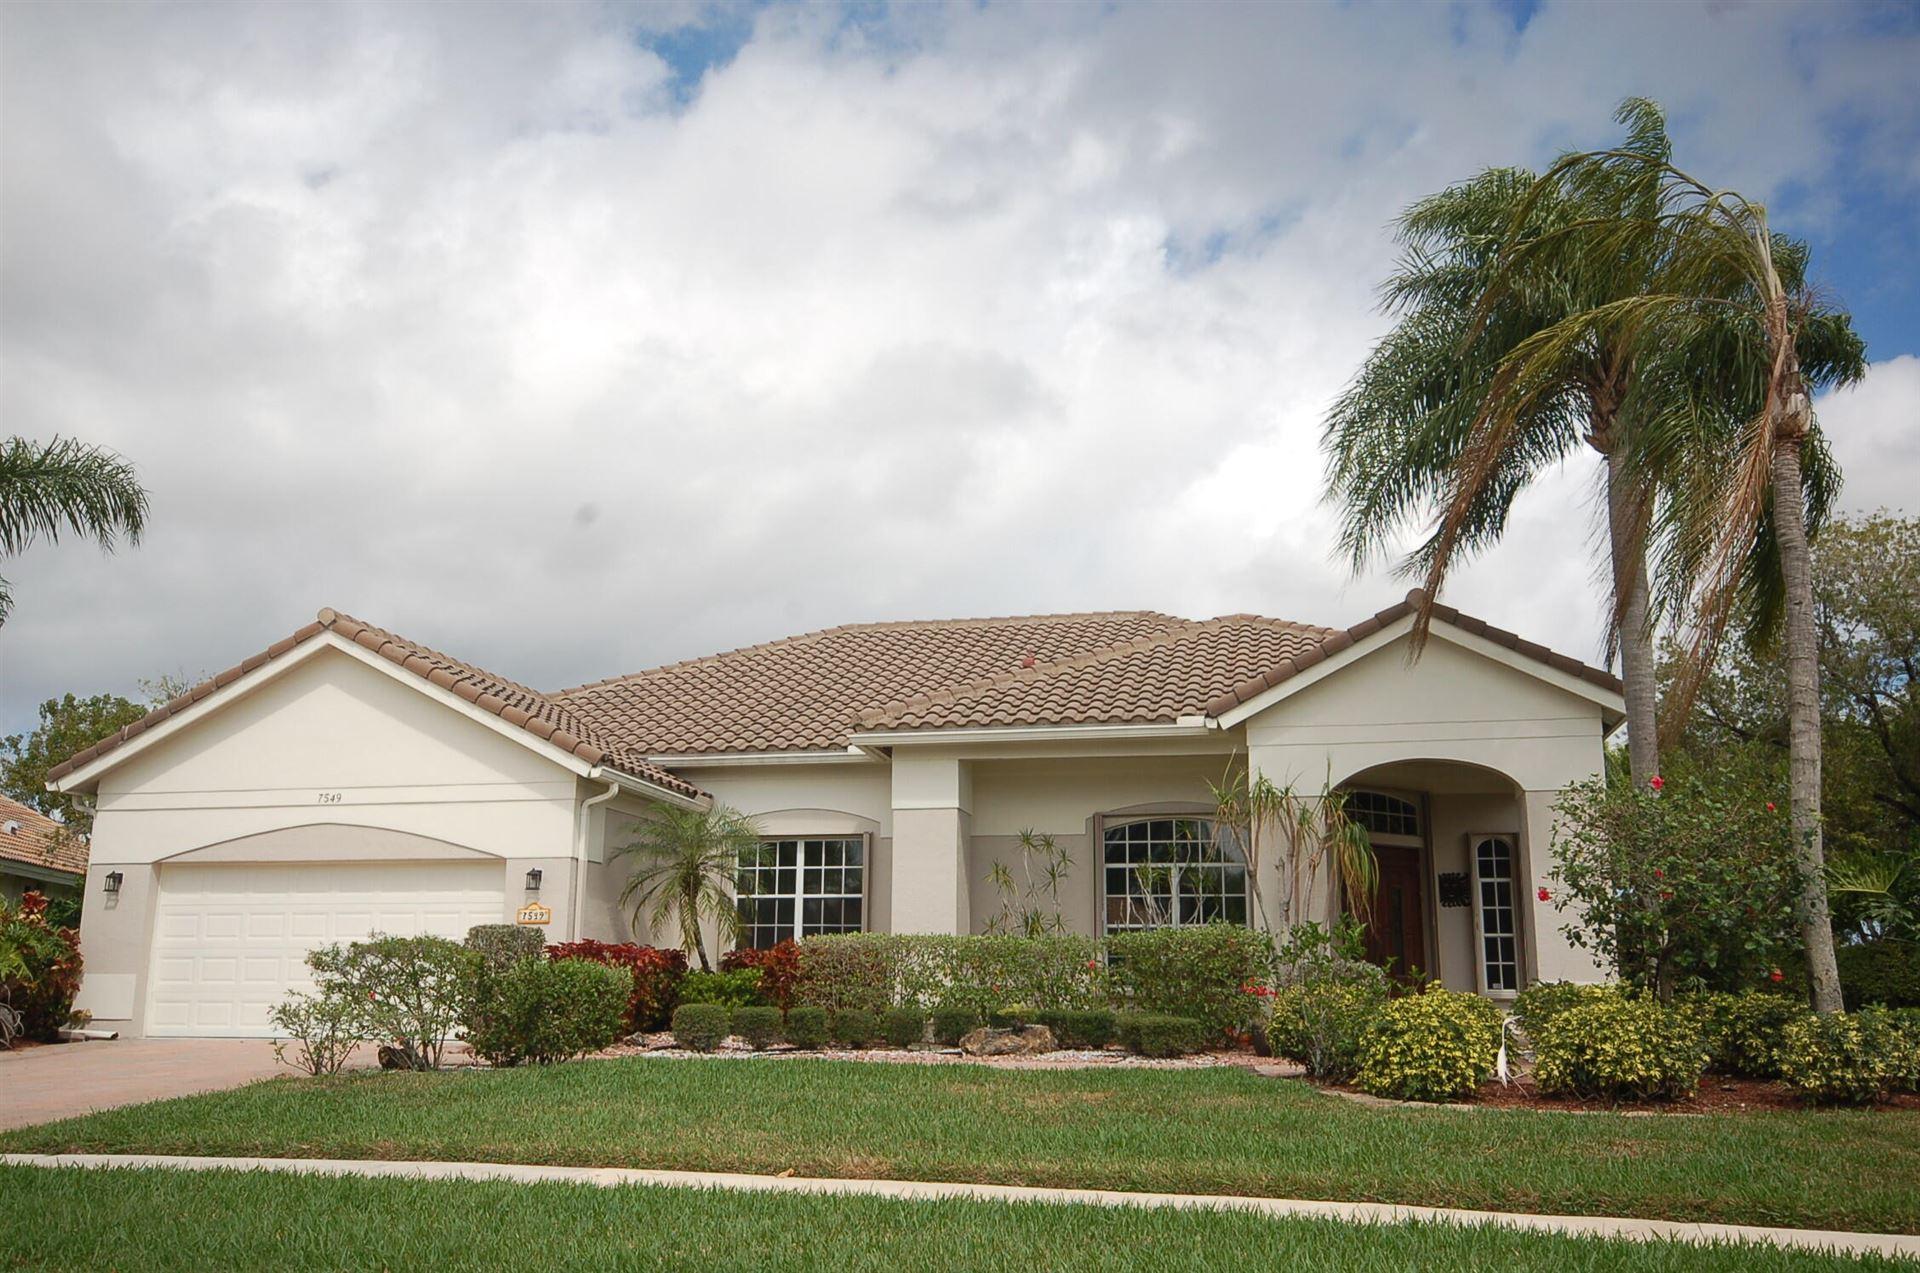 7549 Northport Drive, Boynton Beach, FL 33472 - #: RX-10695524